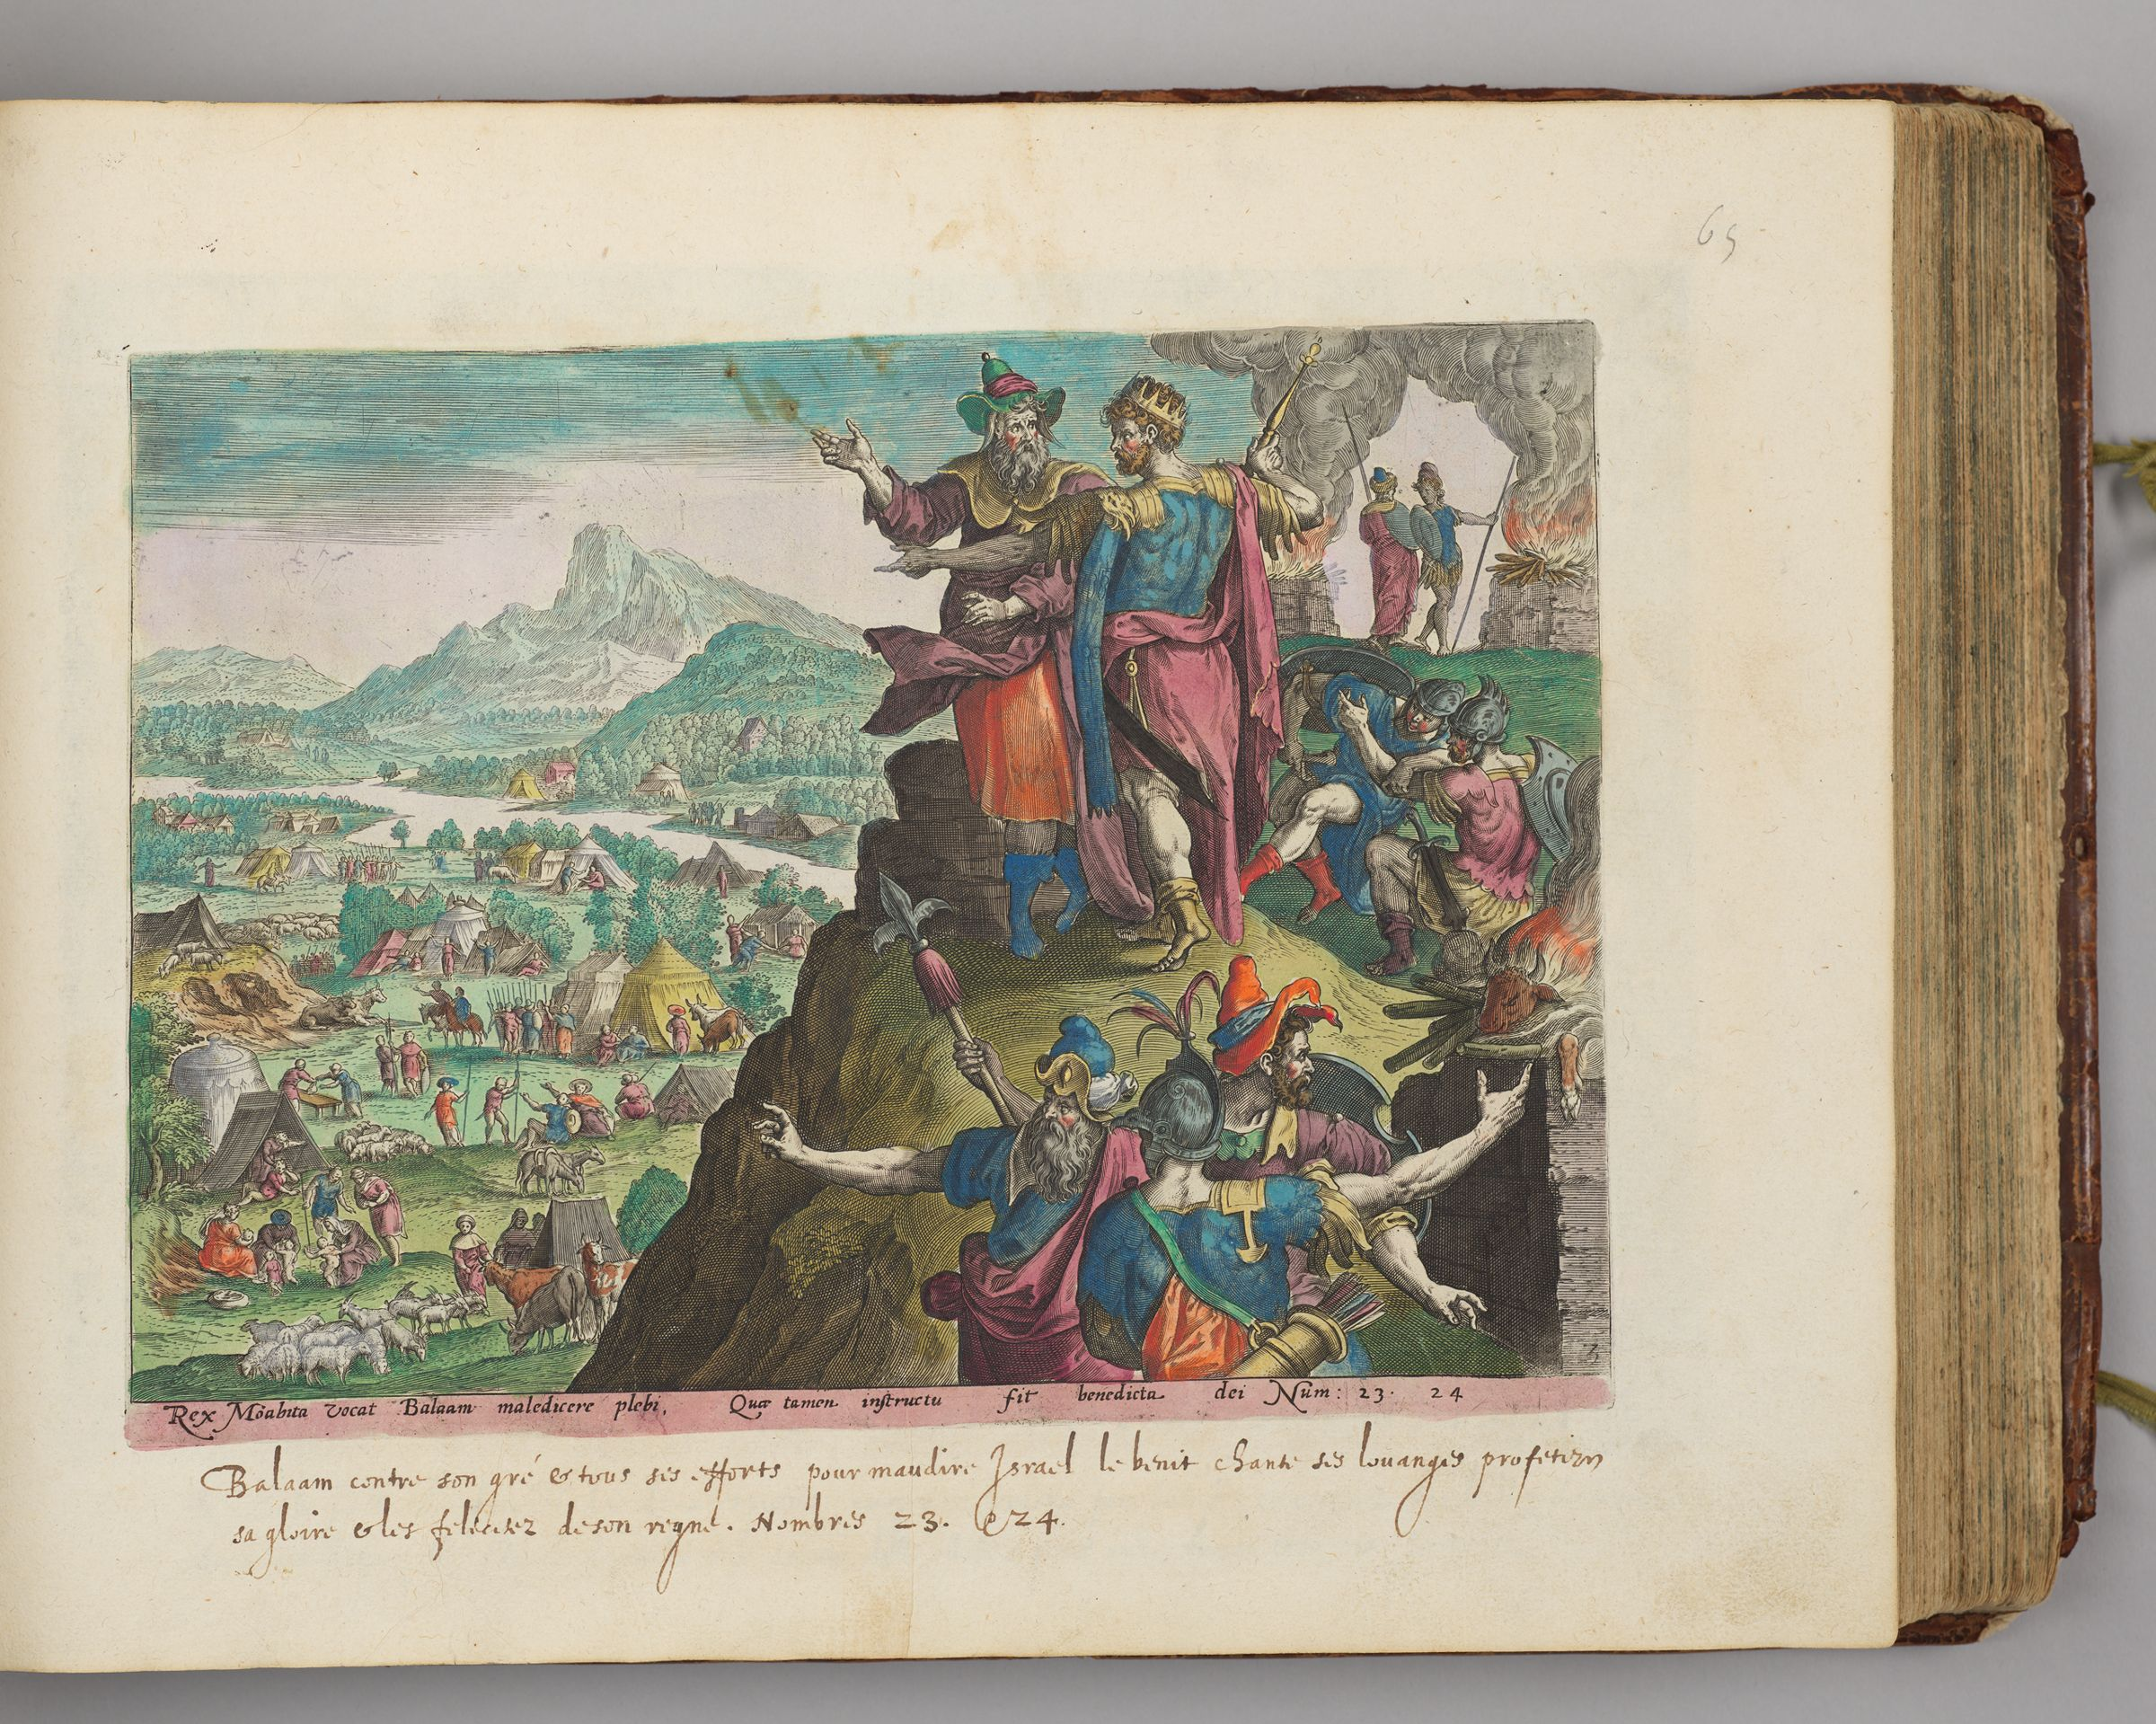 Balaam On Mount Peor Seeing The Israelite Camp